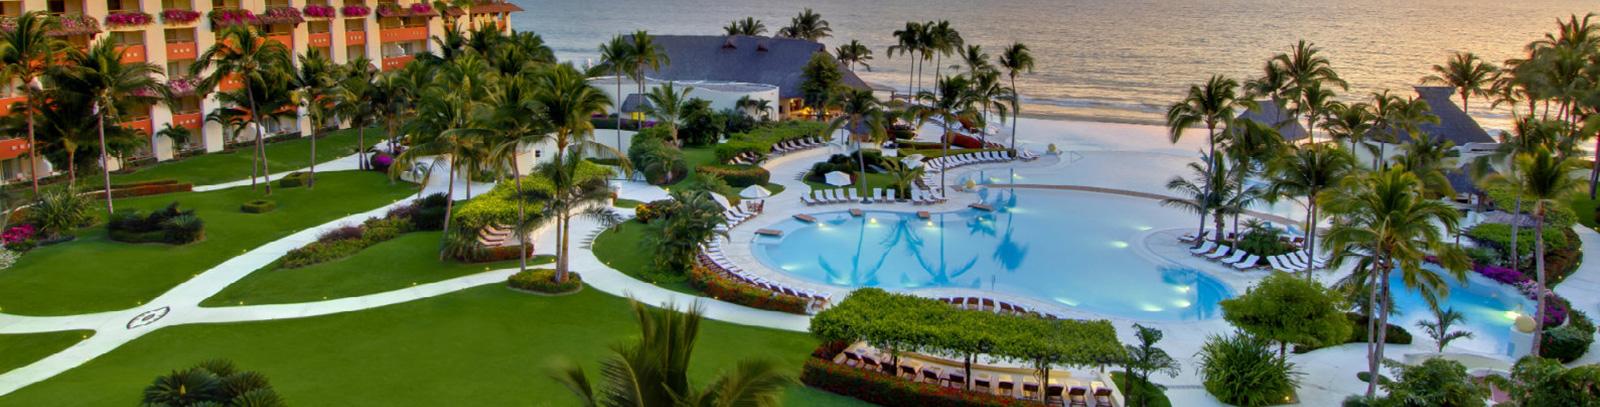 Grand Velas Riviera Nayarit, Mexico